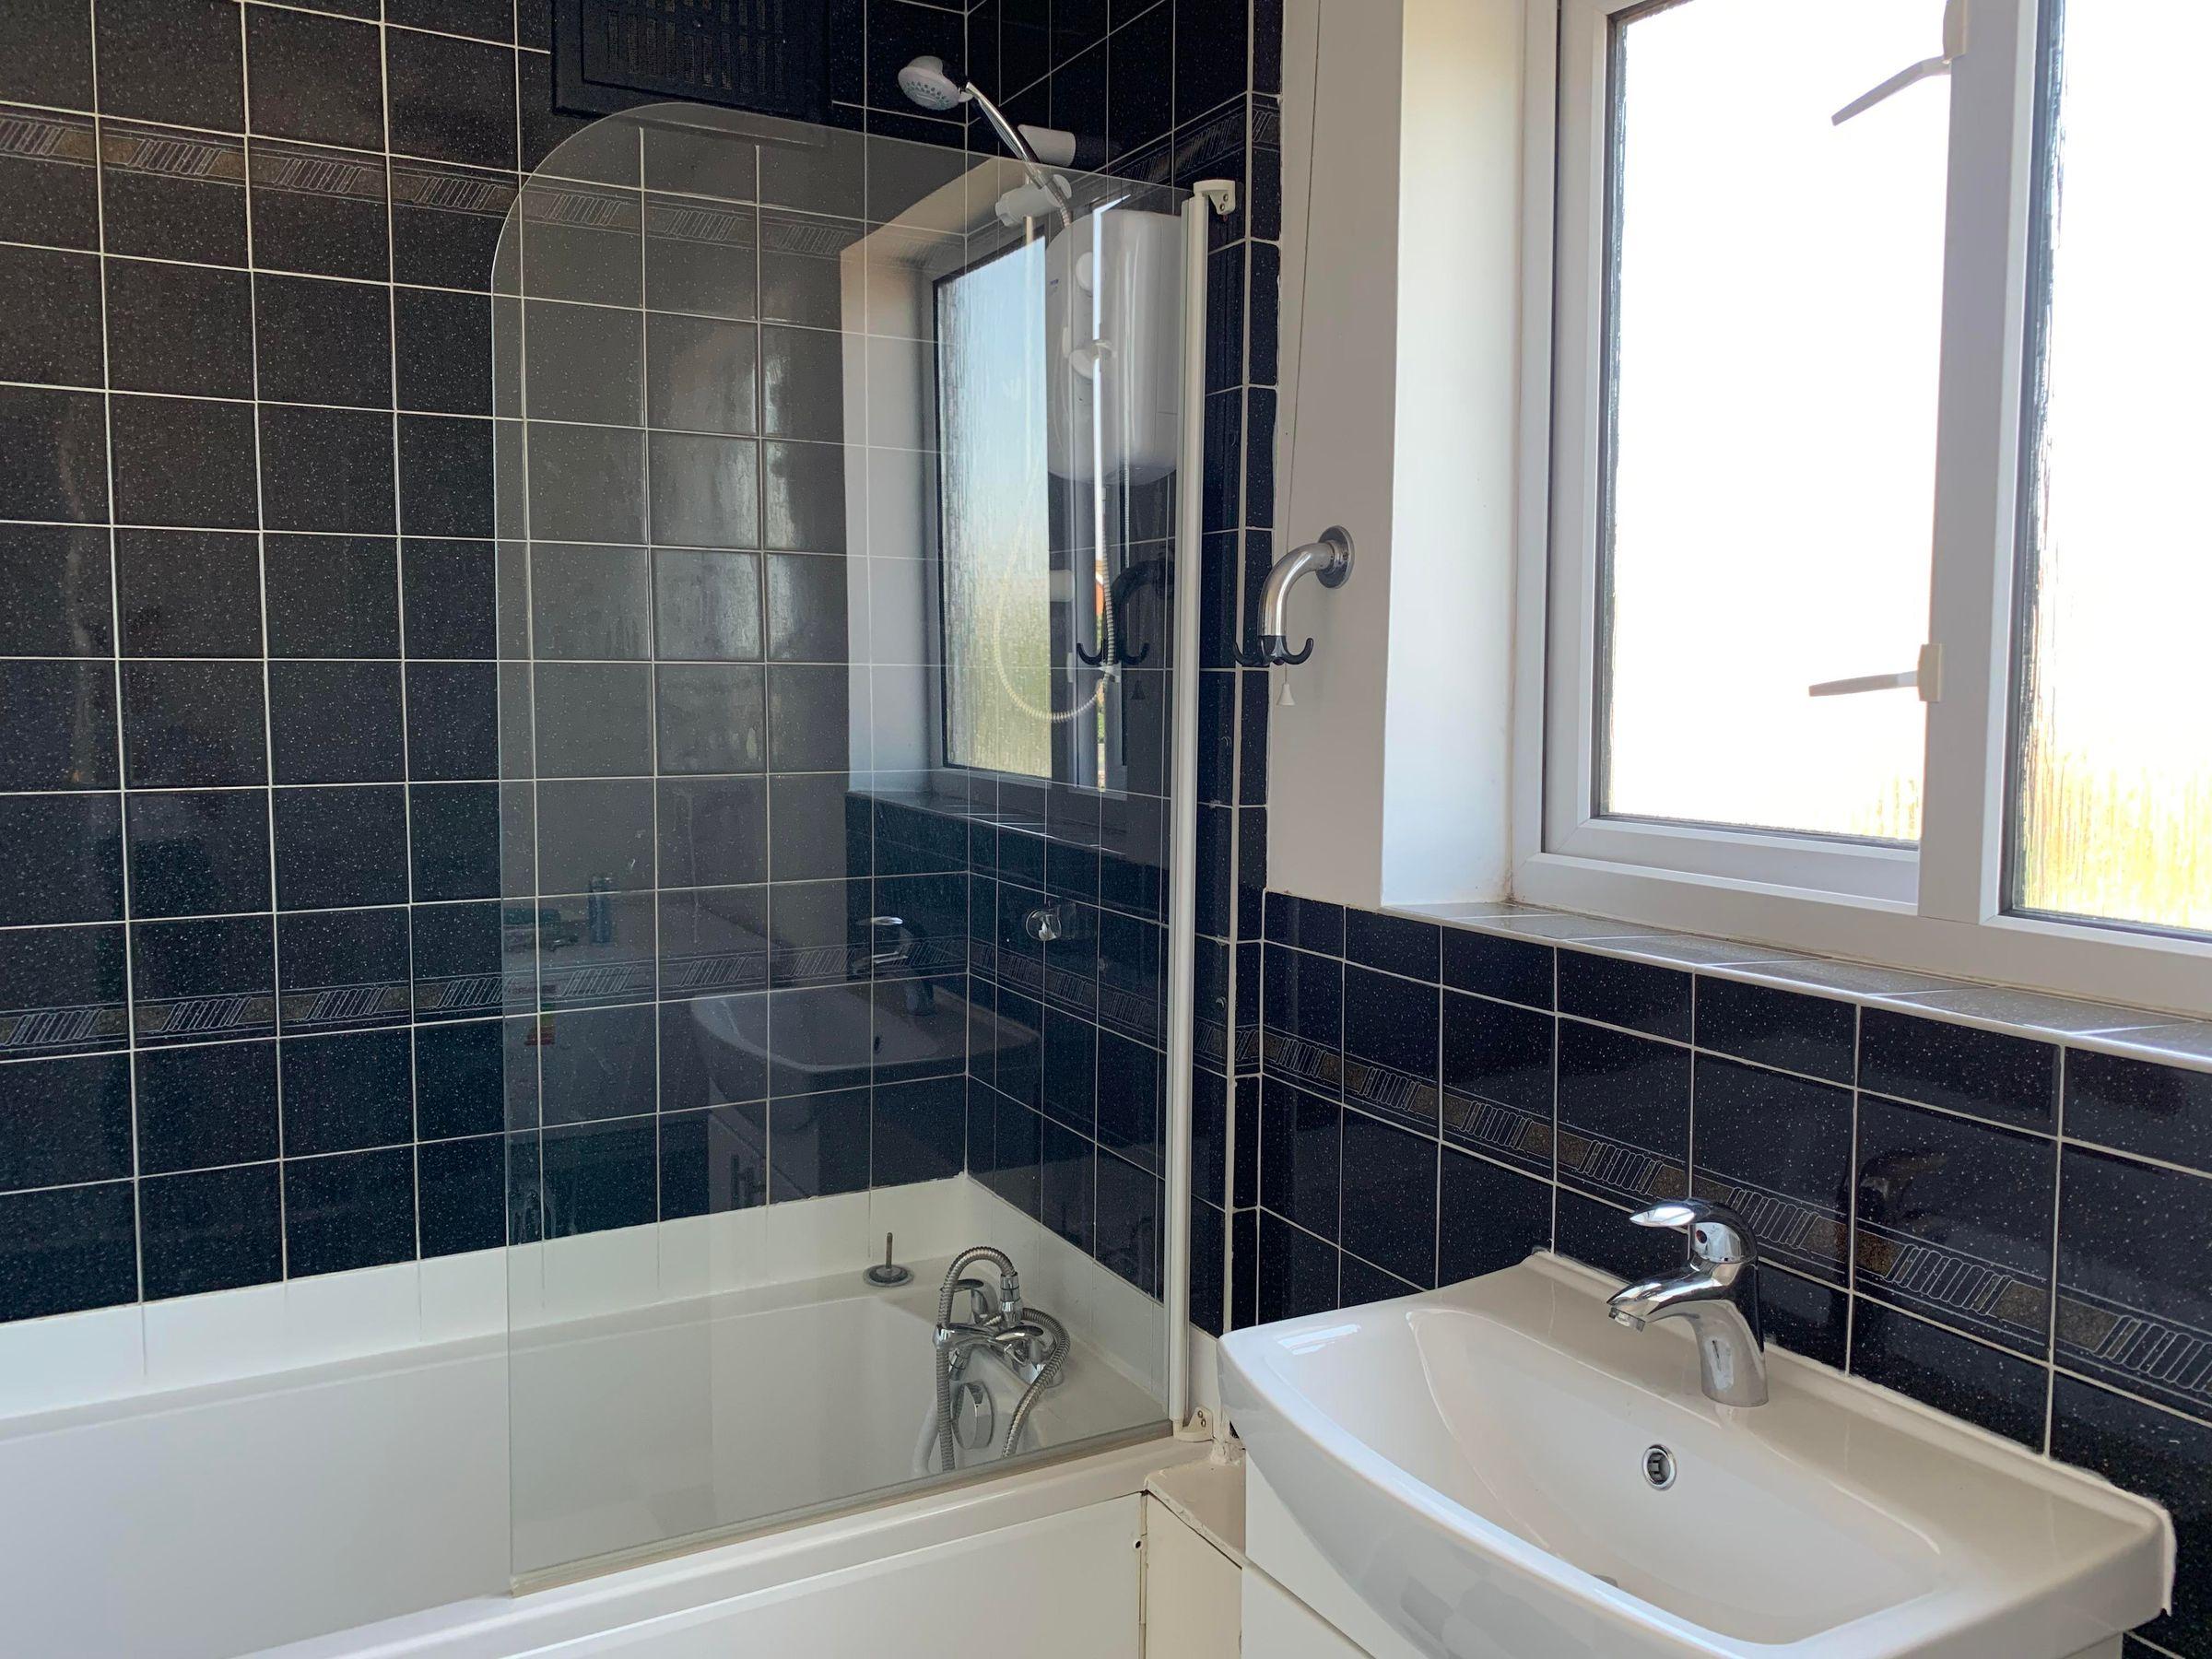 Property photo 1 of 8. Bathroom